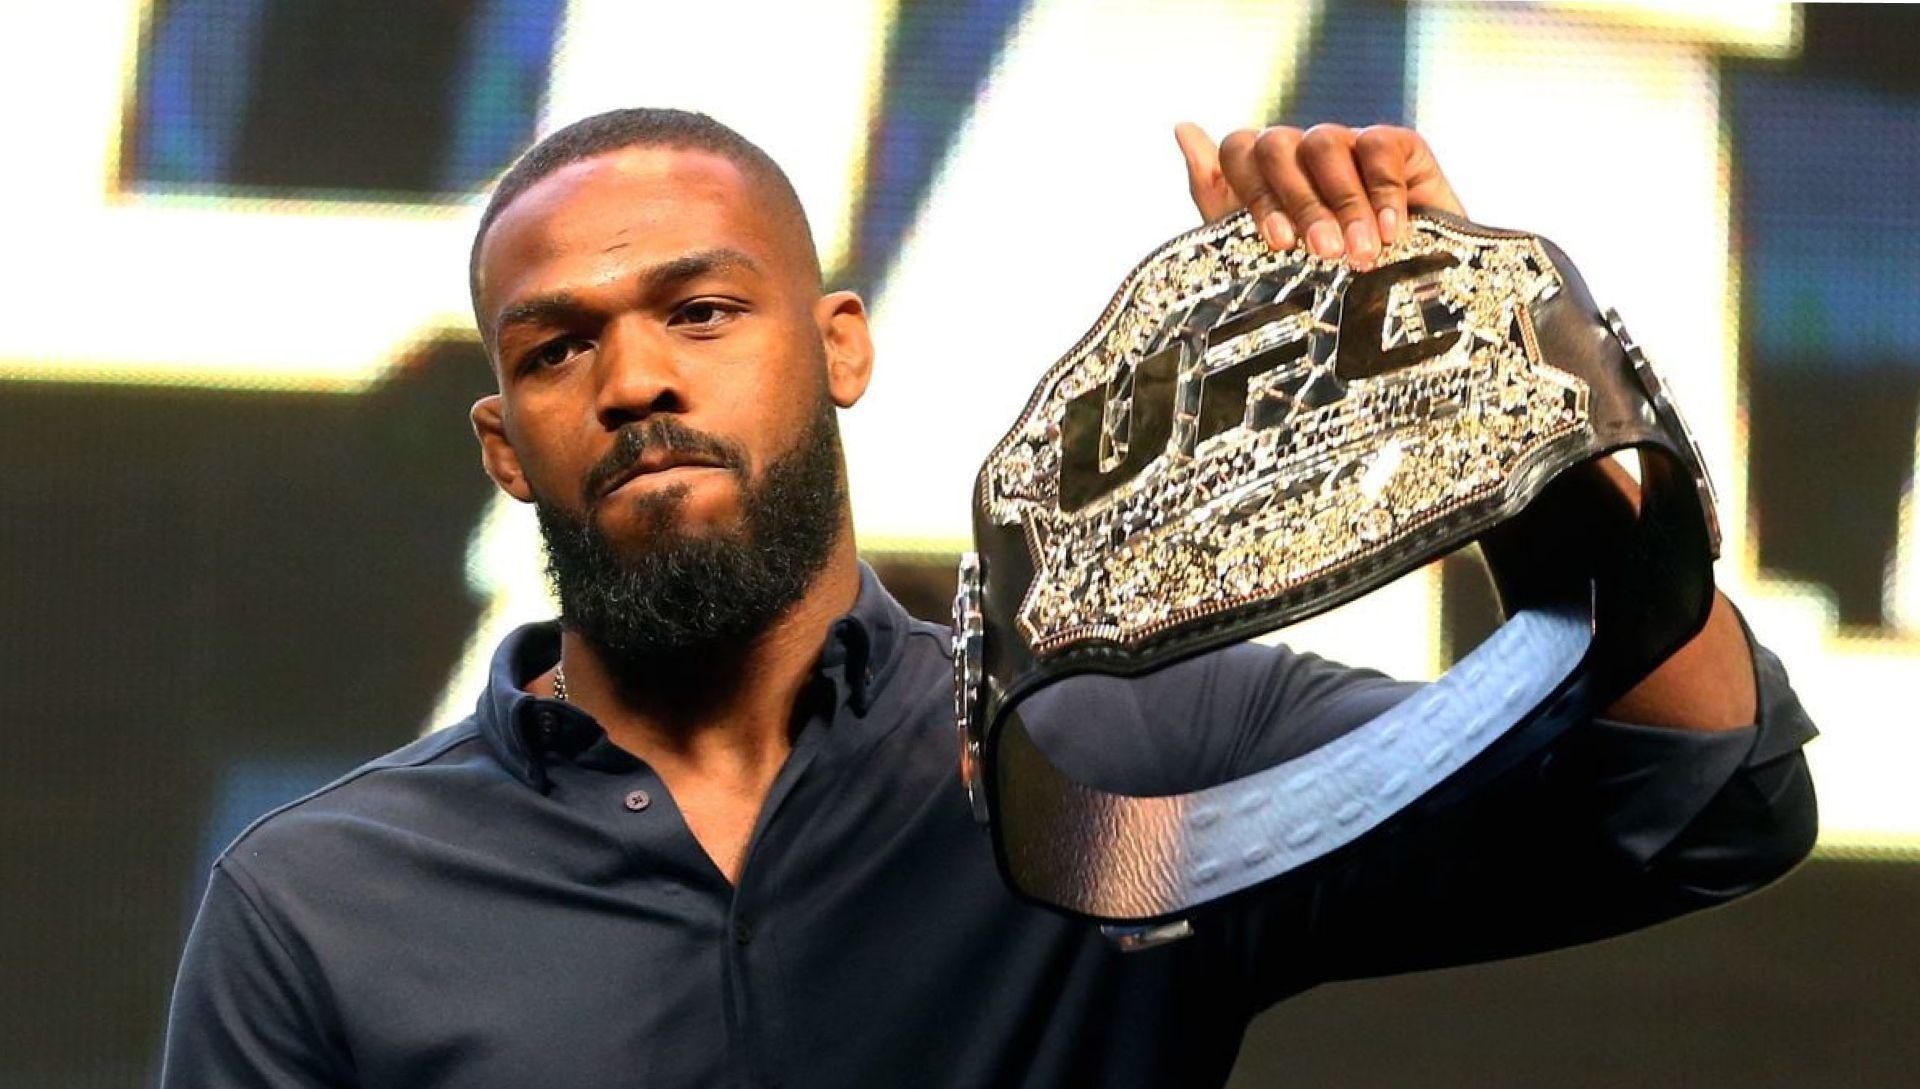 Georges St-Pierre believes Jon Jones should wait for title fight against Francis Ngannou